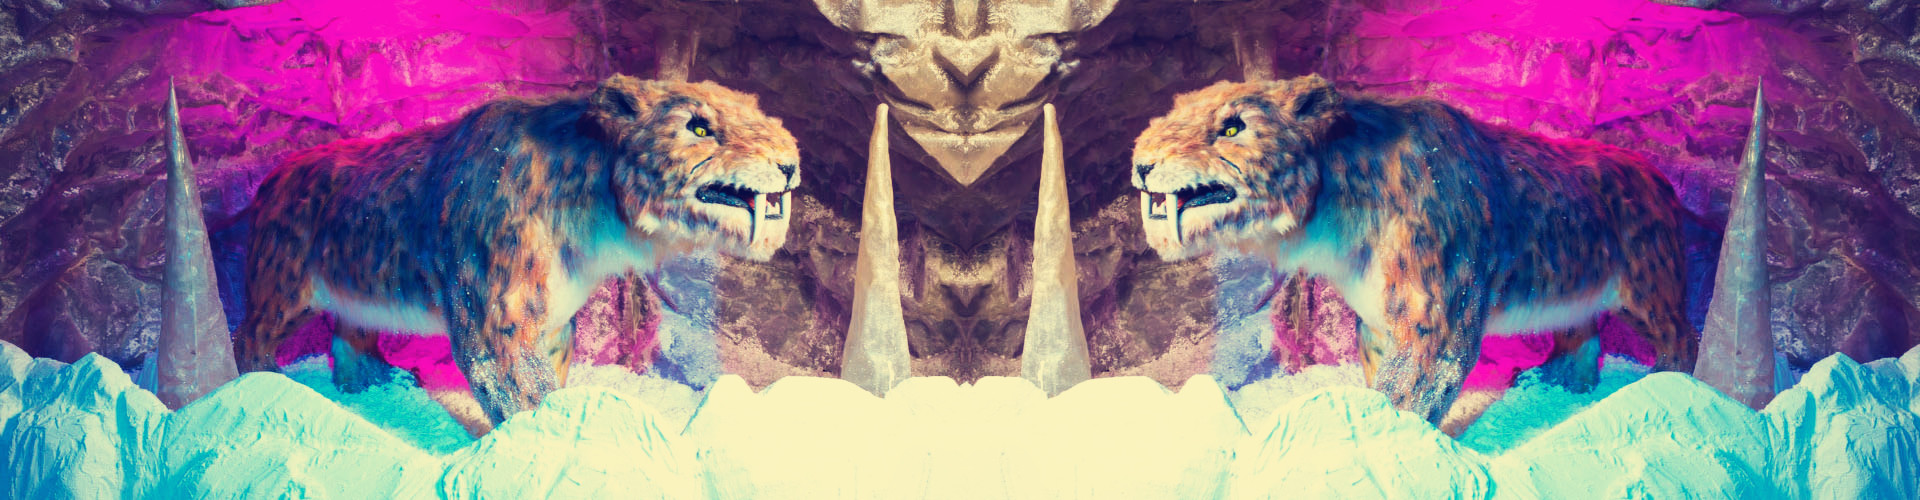 Animatronic smilodon Banner